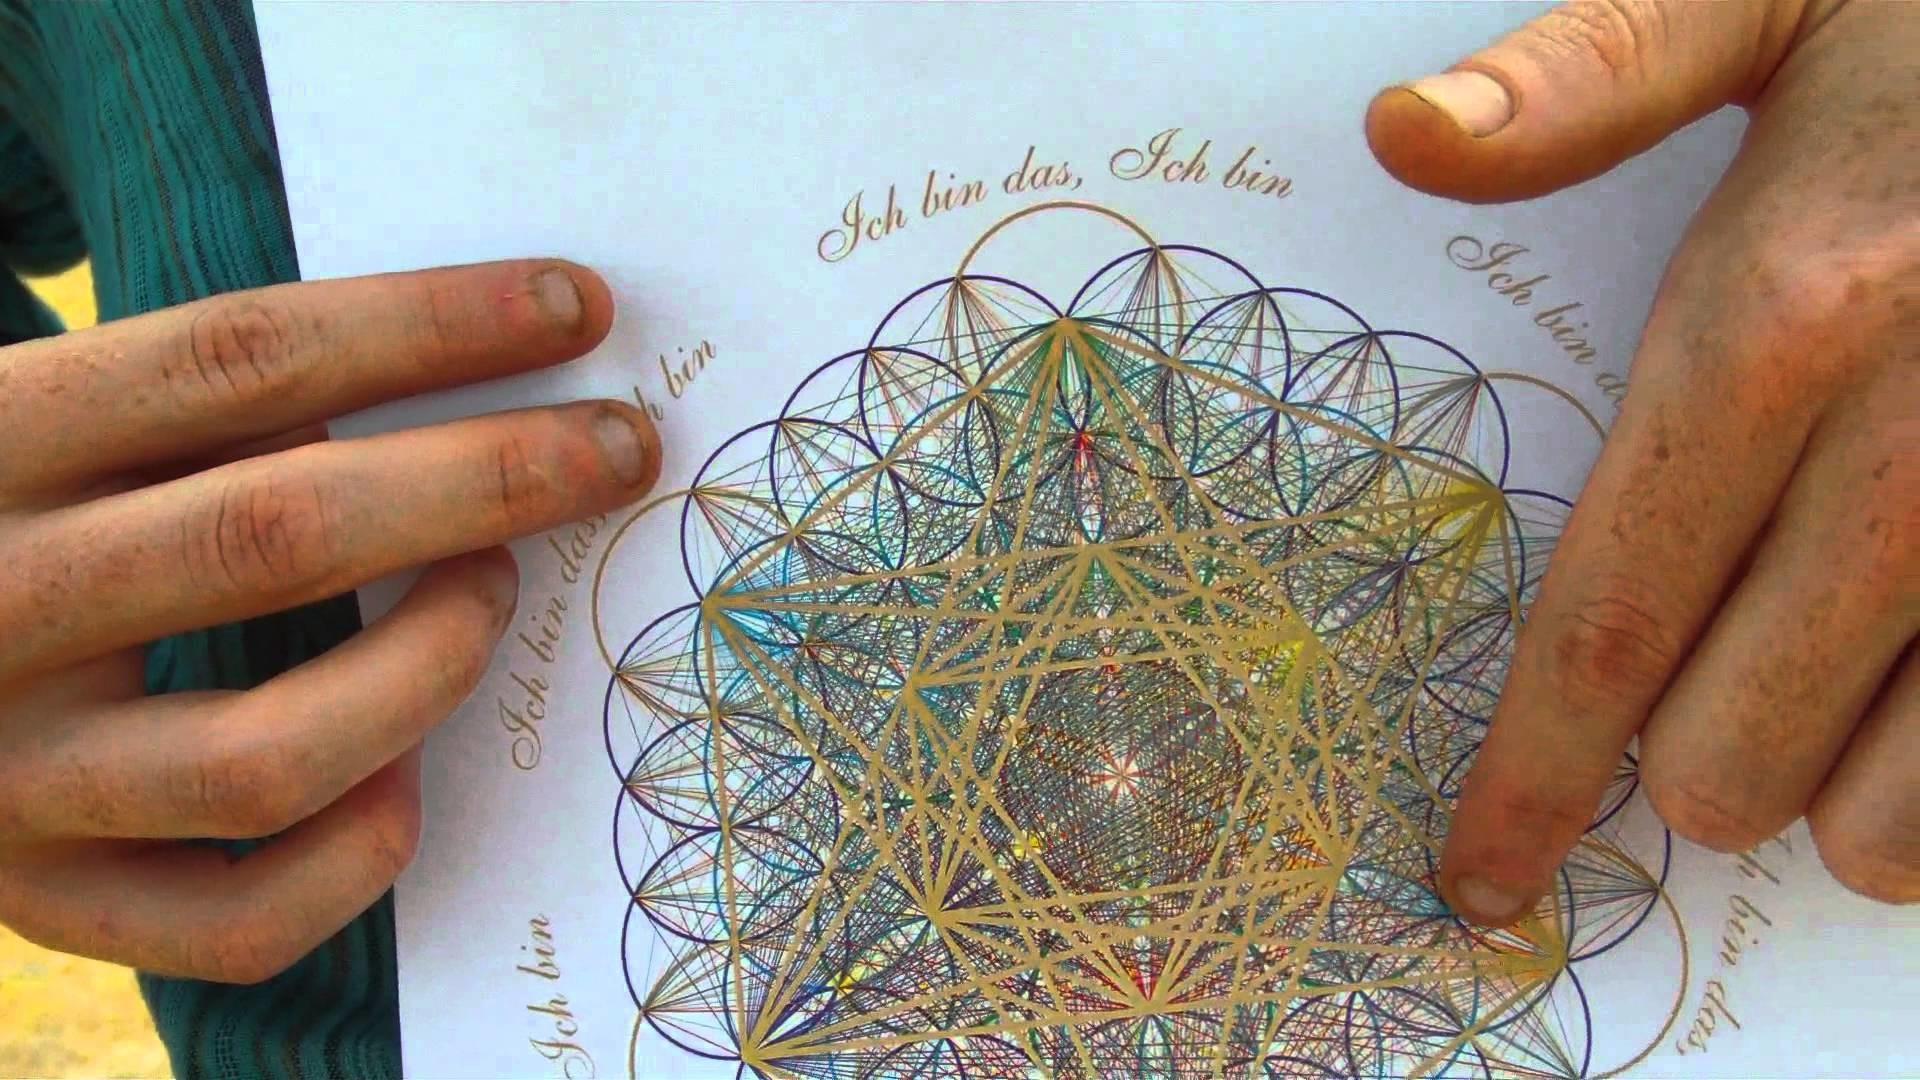 The Flower of Life & Metatron Cube